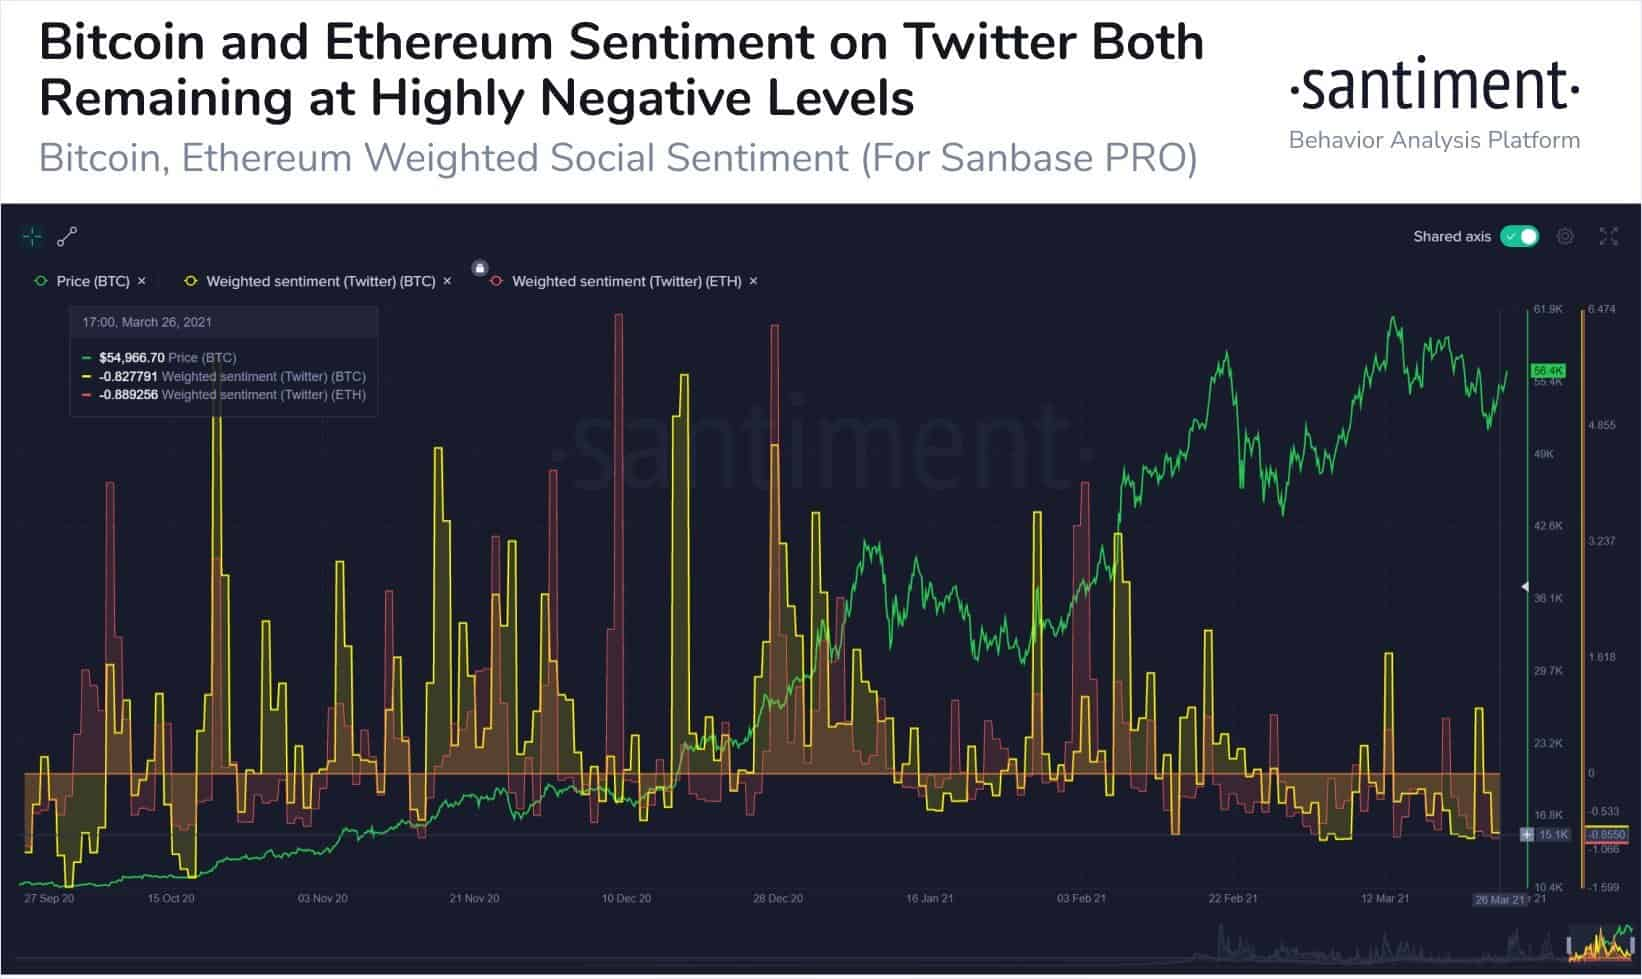 Bitcoin and Ethereum Social Sentiment Vs. Price. Source: Santiment